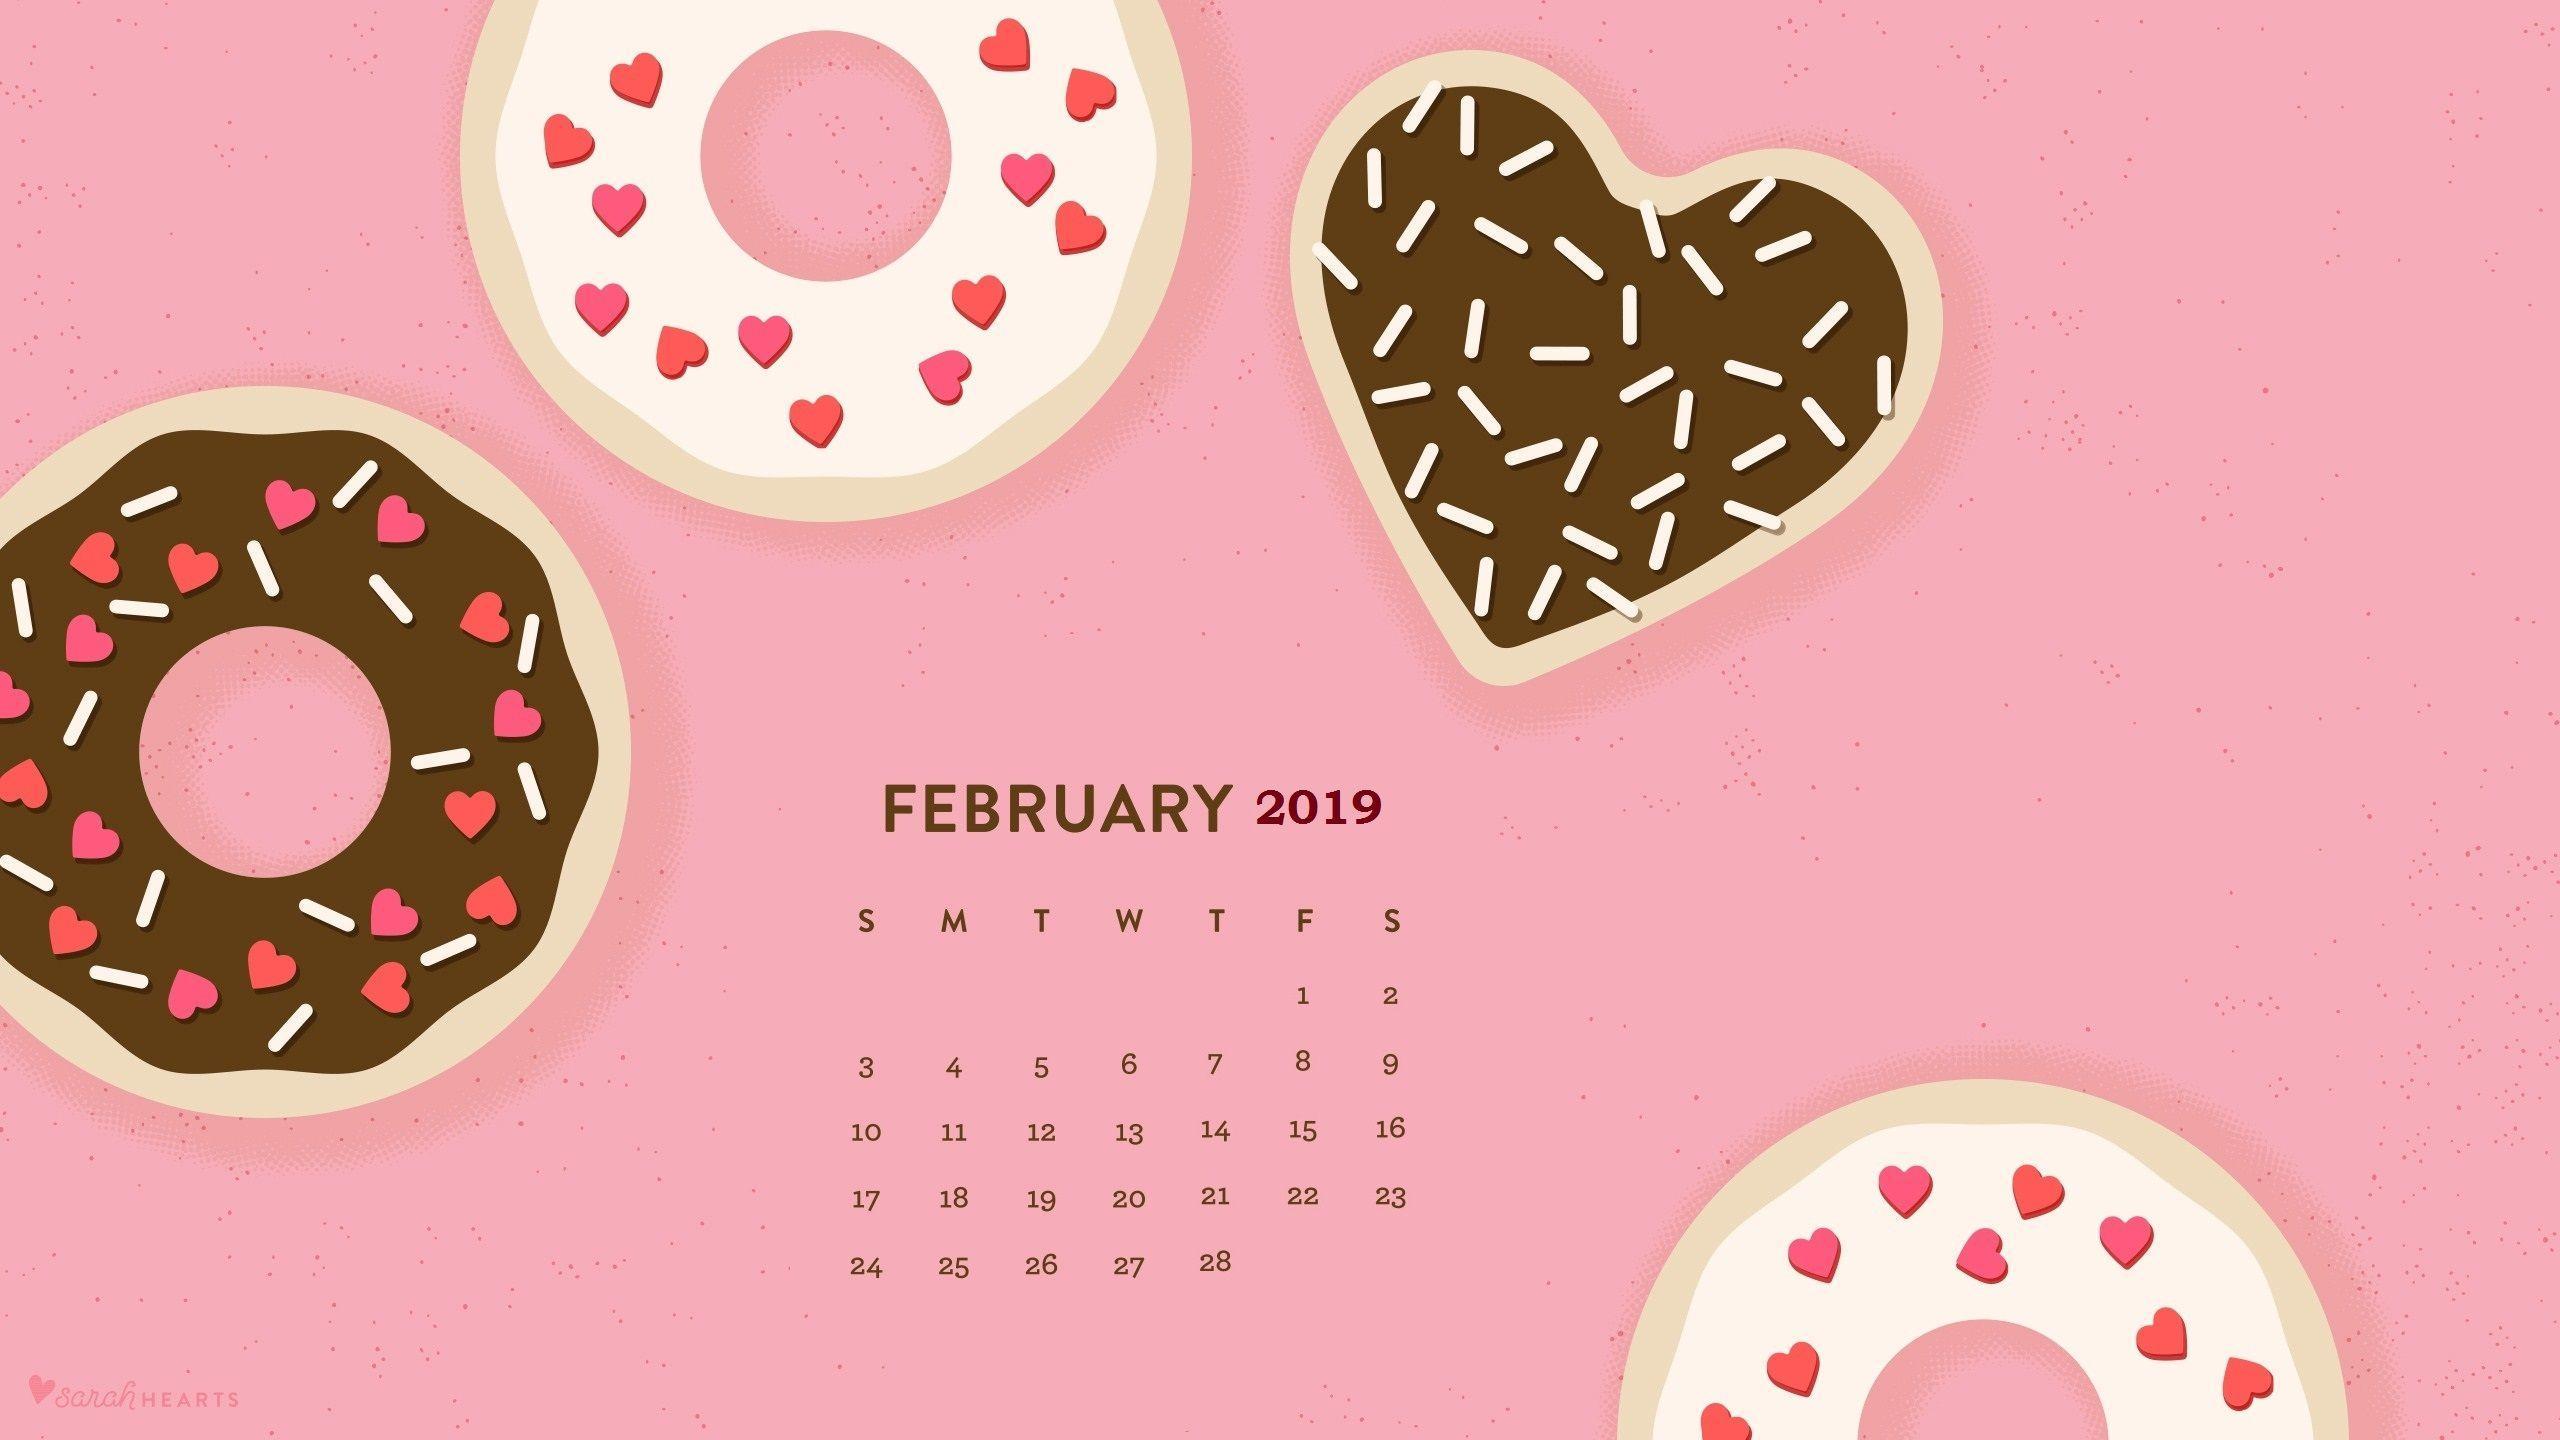 February 2019 Calendar Desktop February 2019 Calendar Wallpapers   Wallpaper Cave